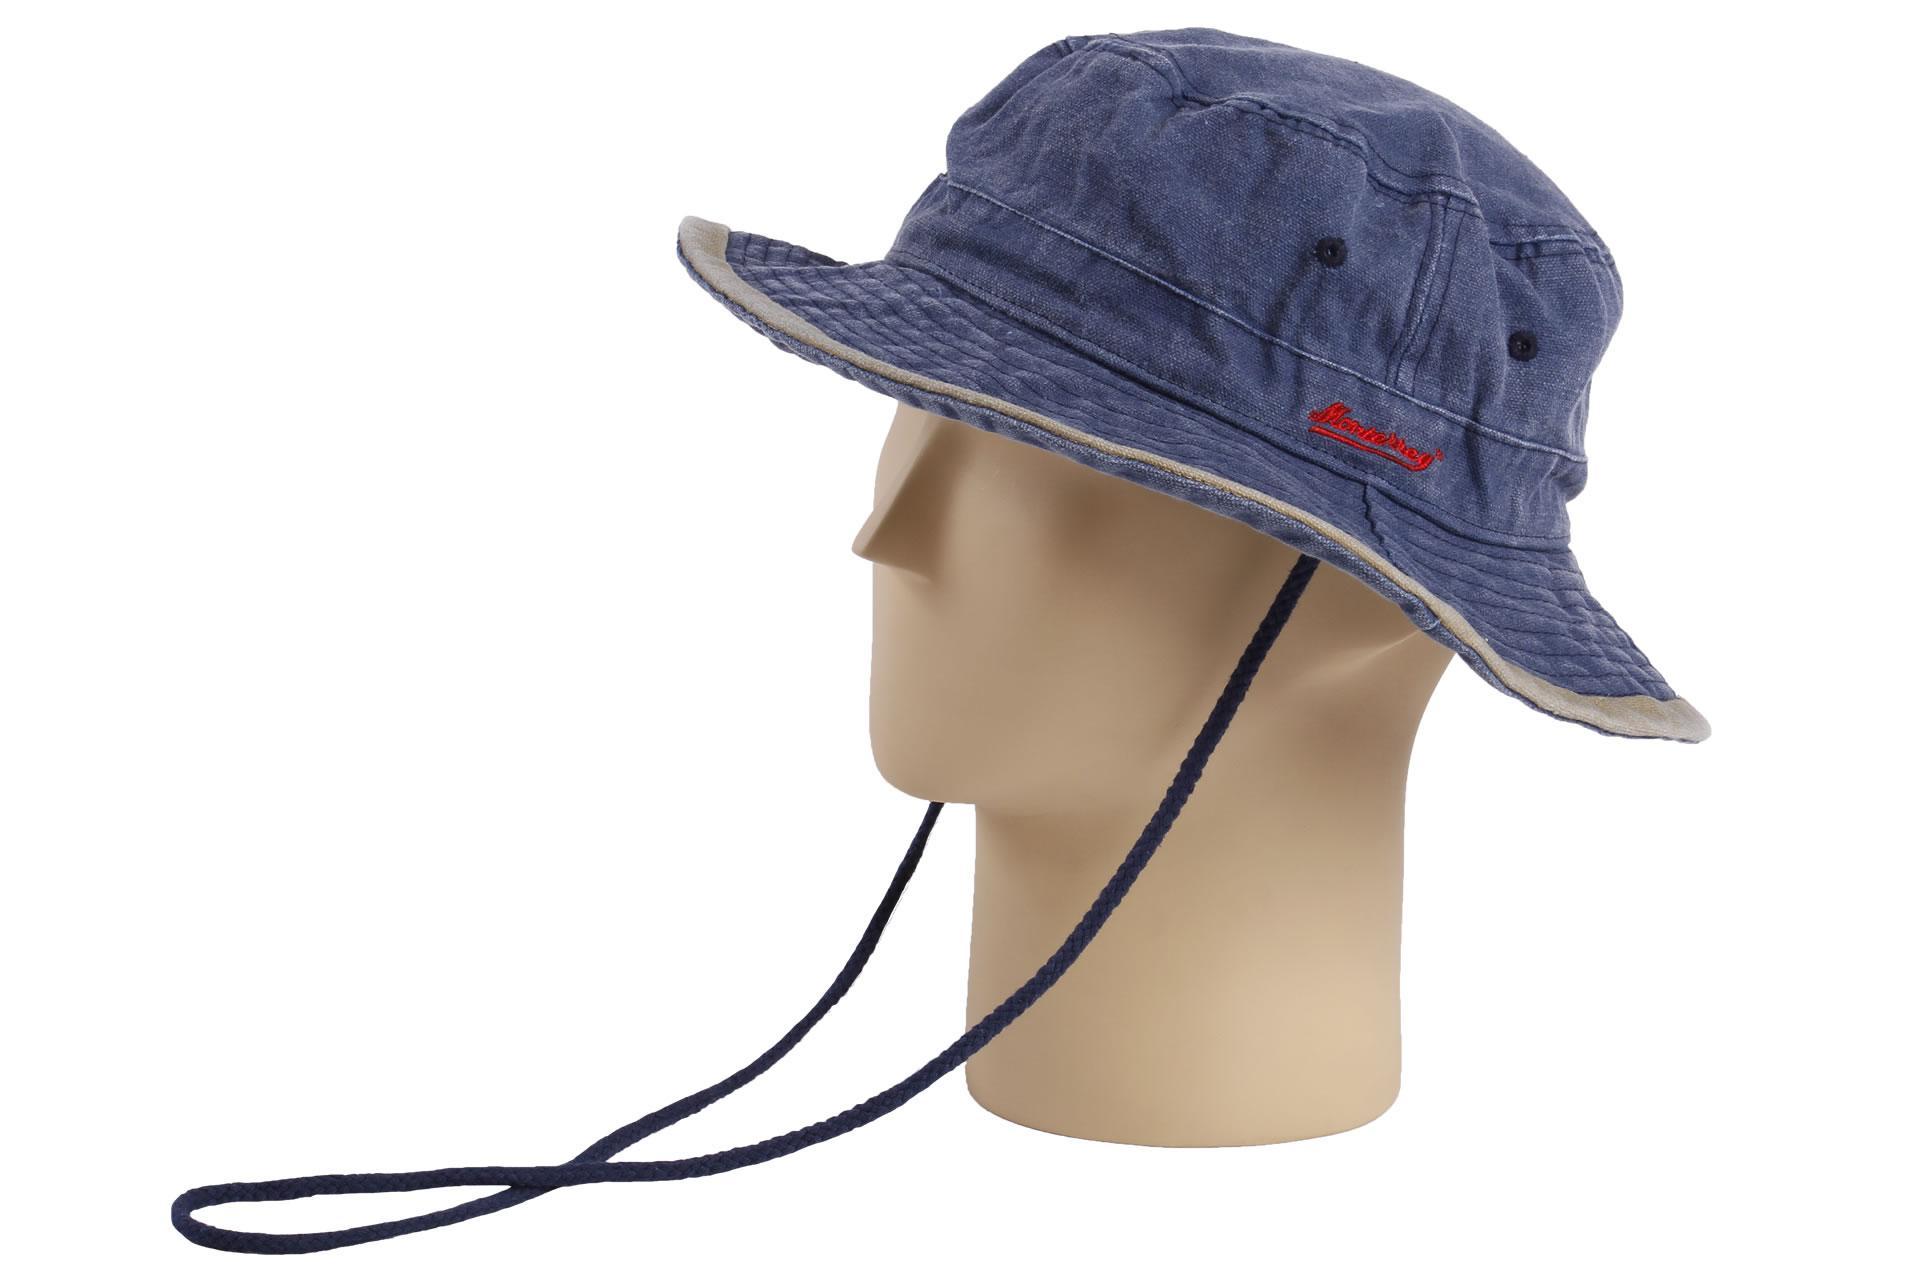 Distribuidora Nacional de Sombreros - Dinalsom ce7d1c7c099